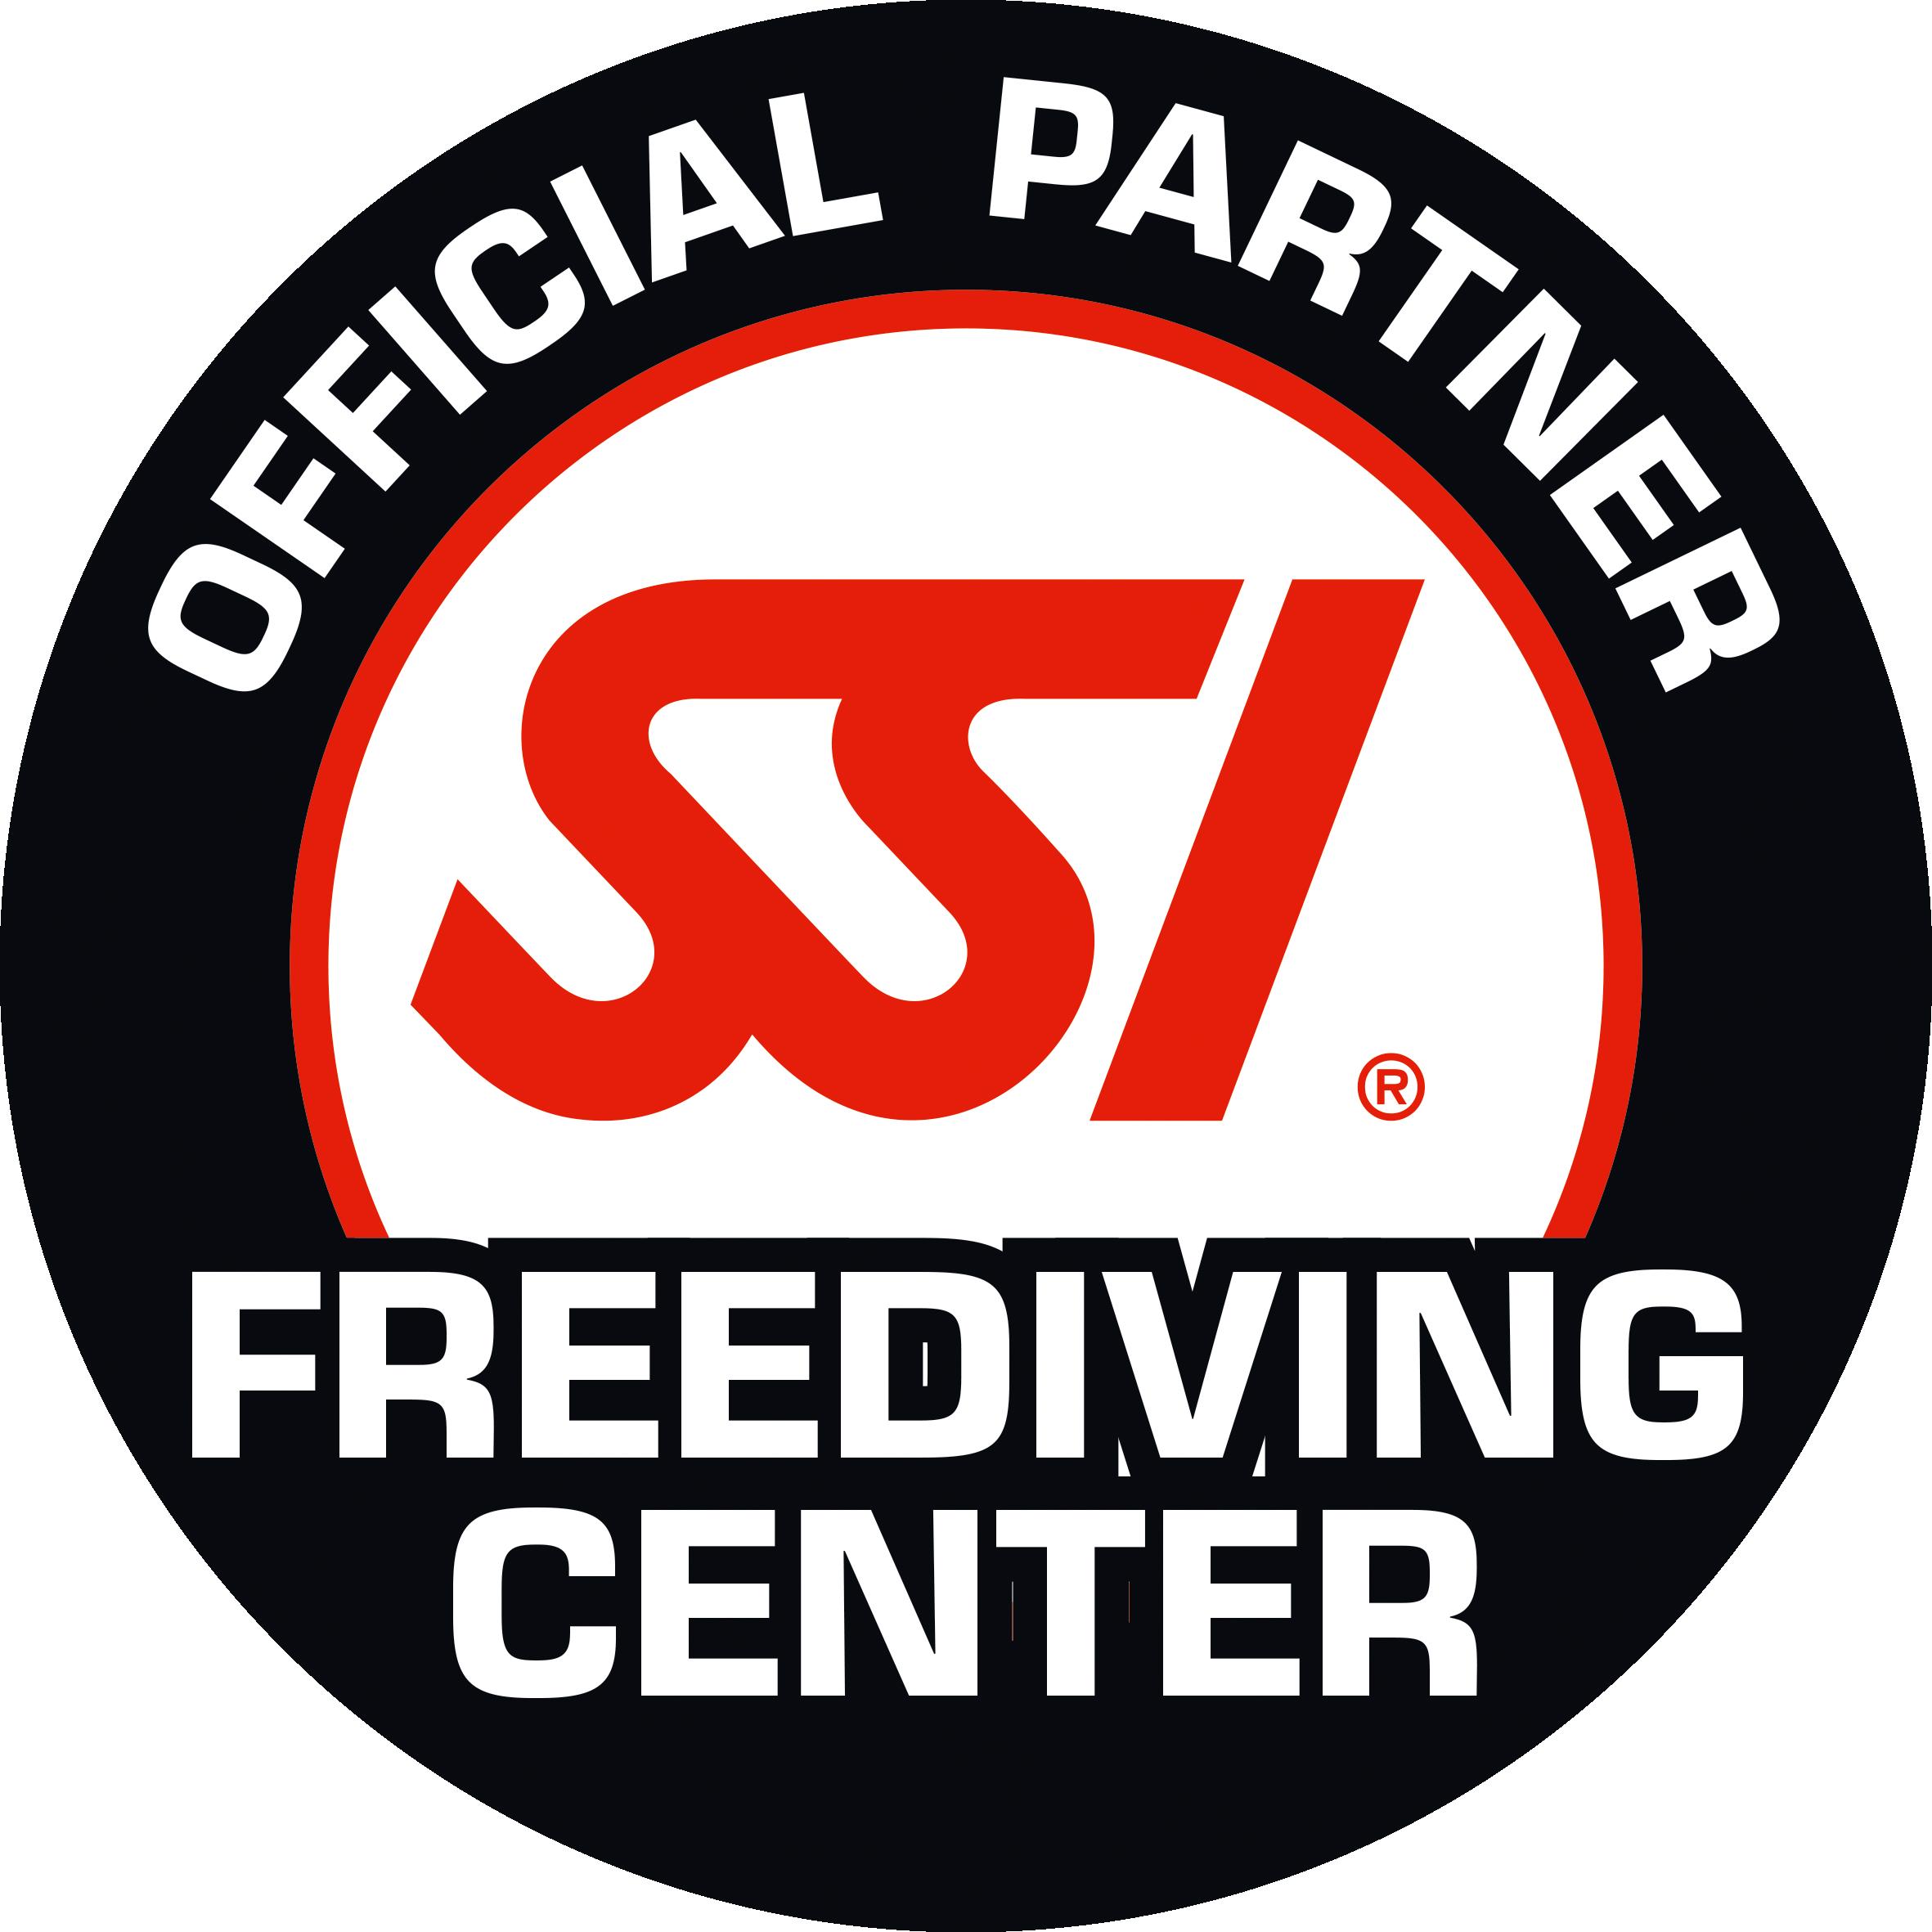 SSI Freediving Center